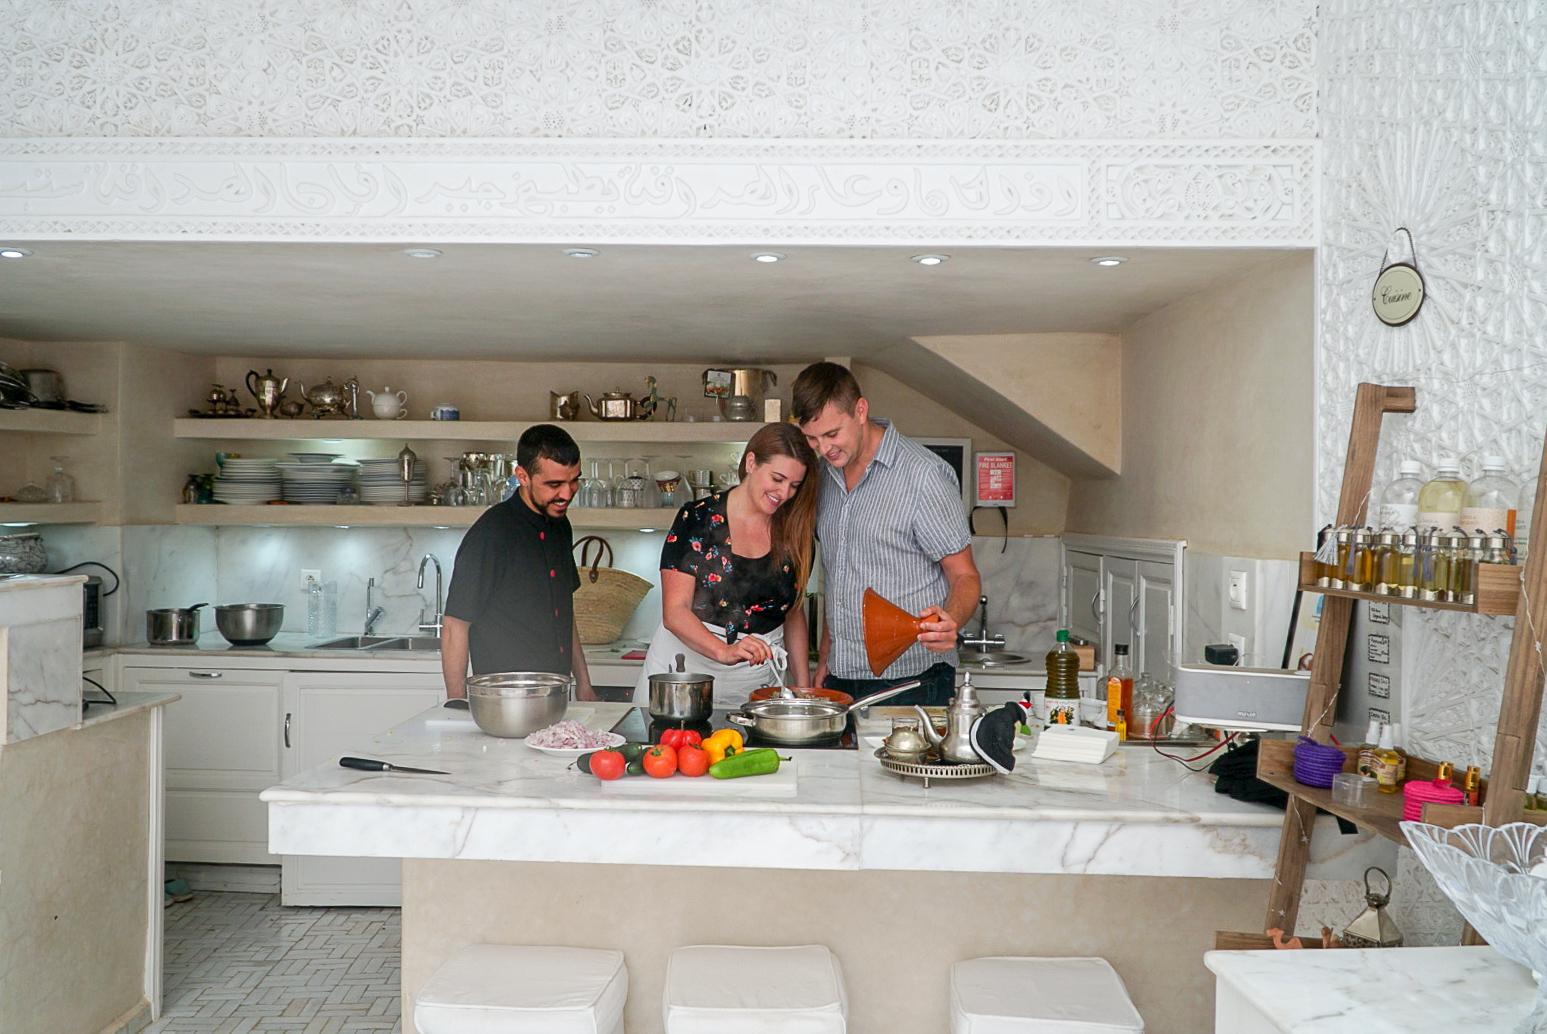 Cooking Class Date - List of Date Ideas